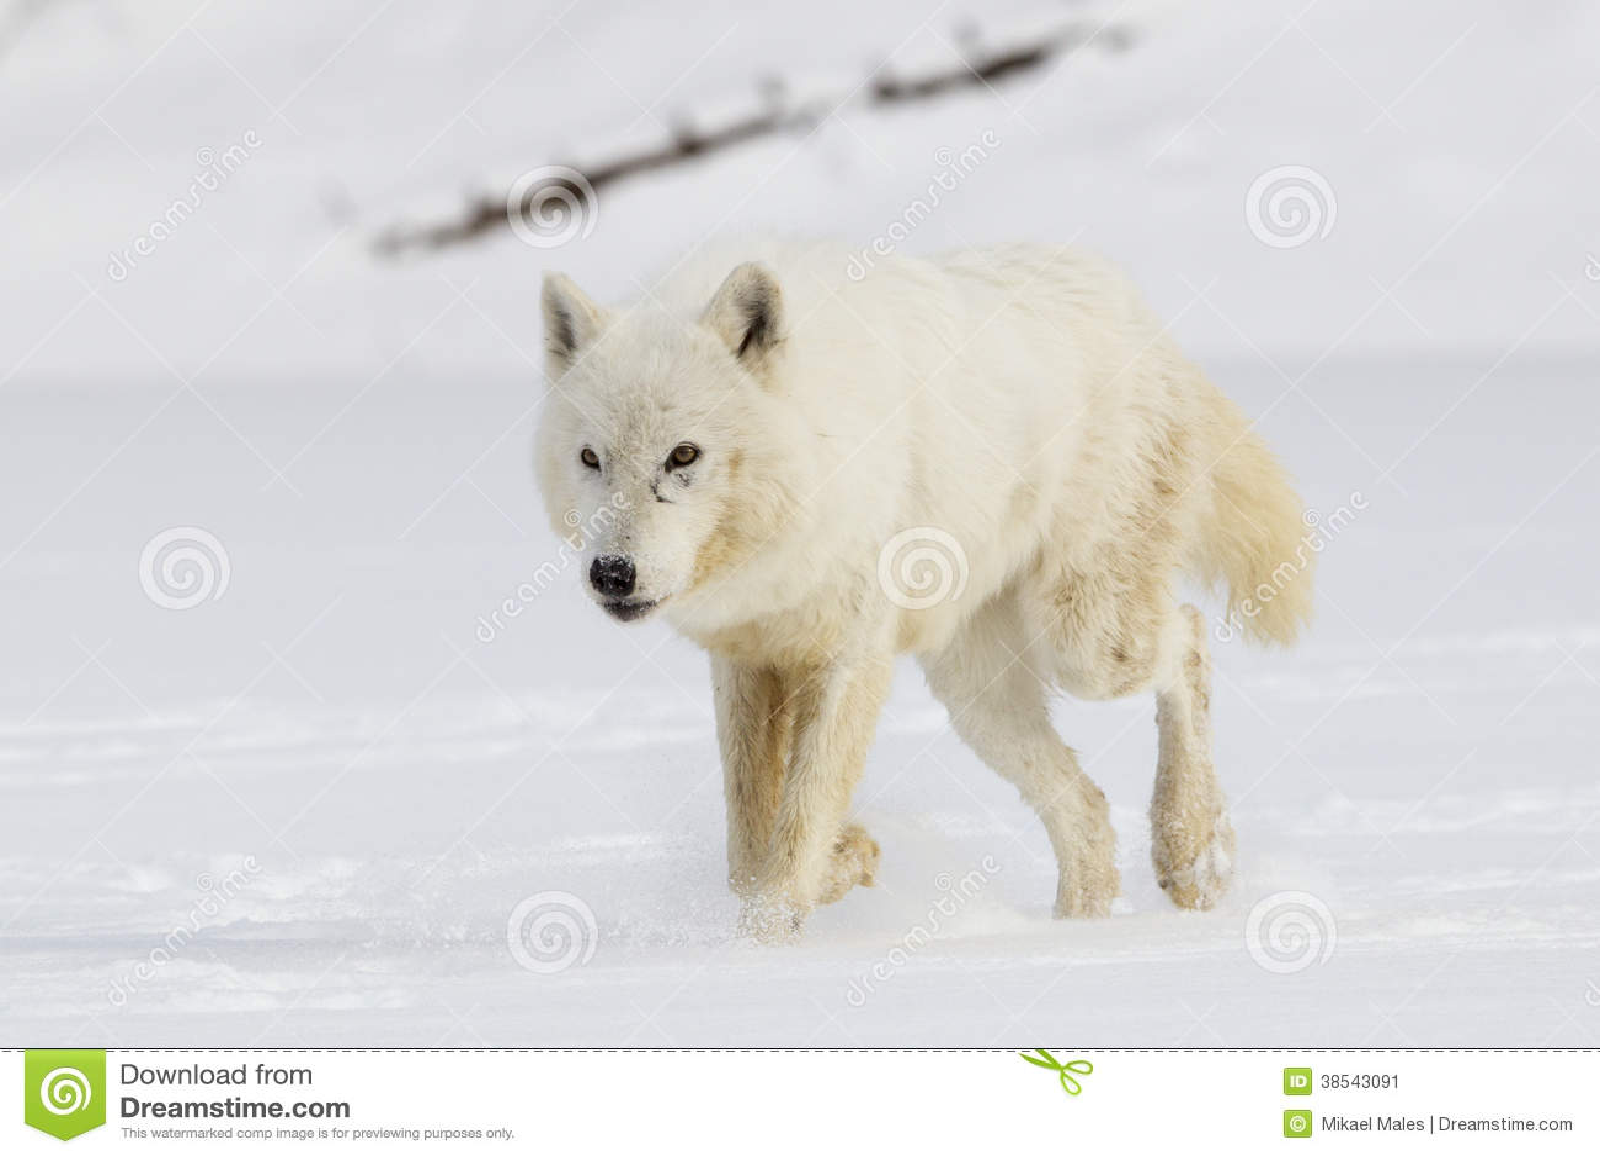 Arctic wolf in snow - photo#25